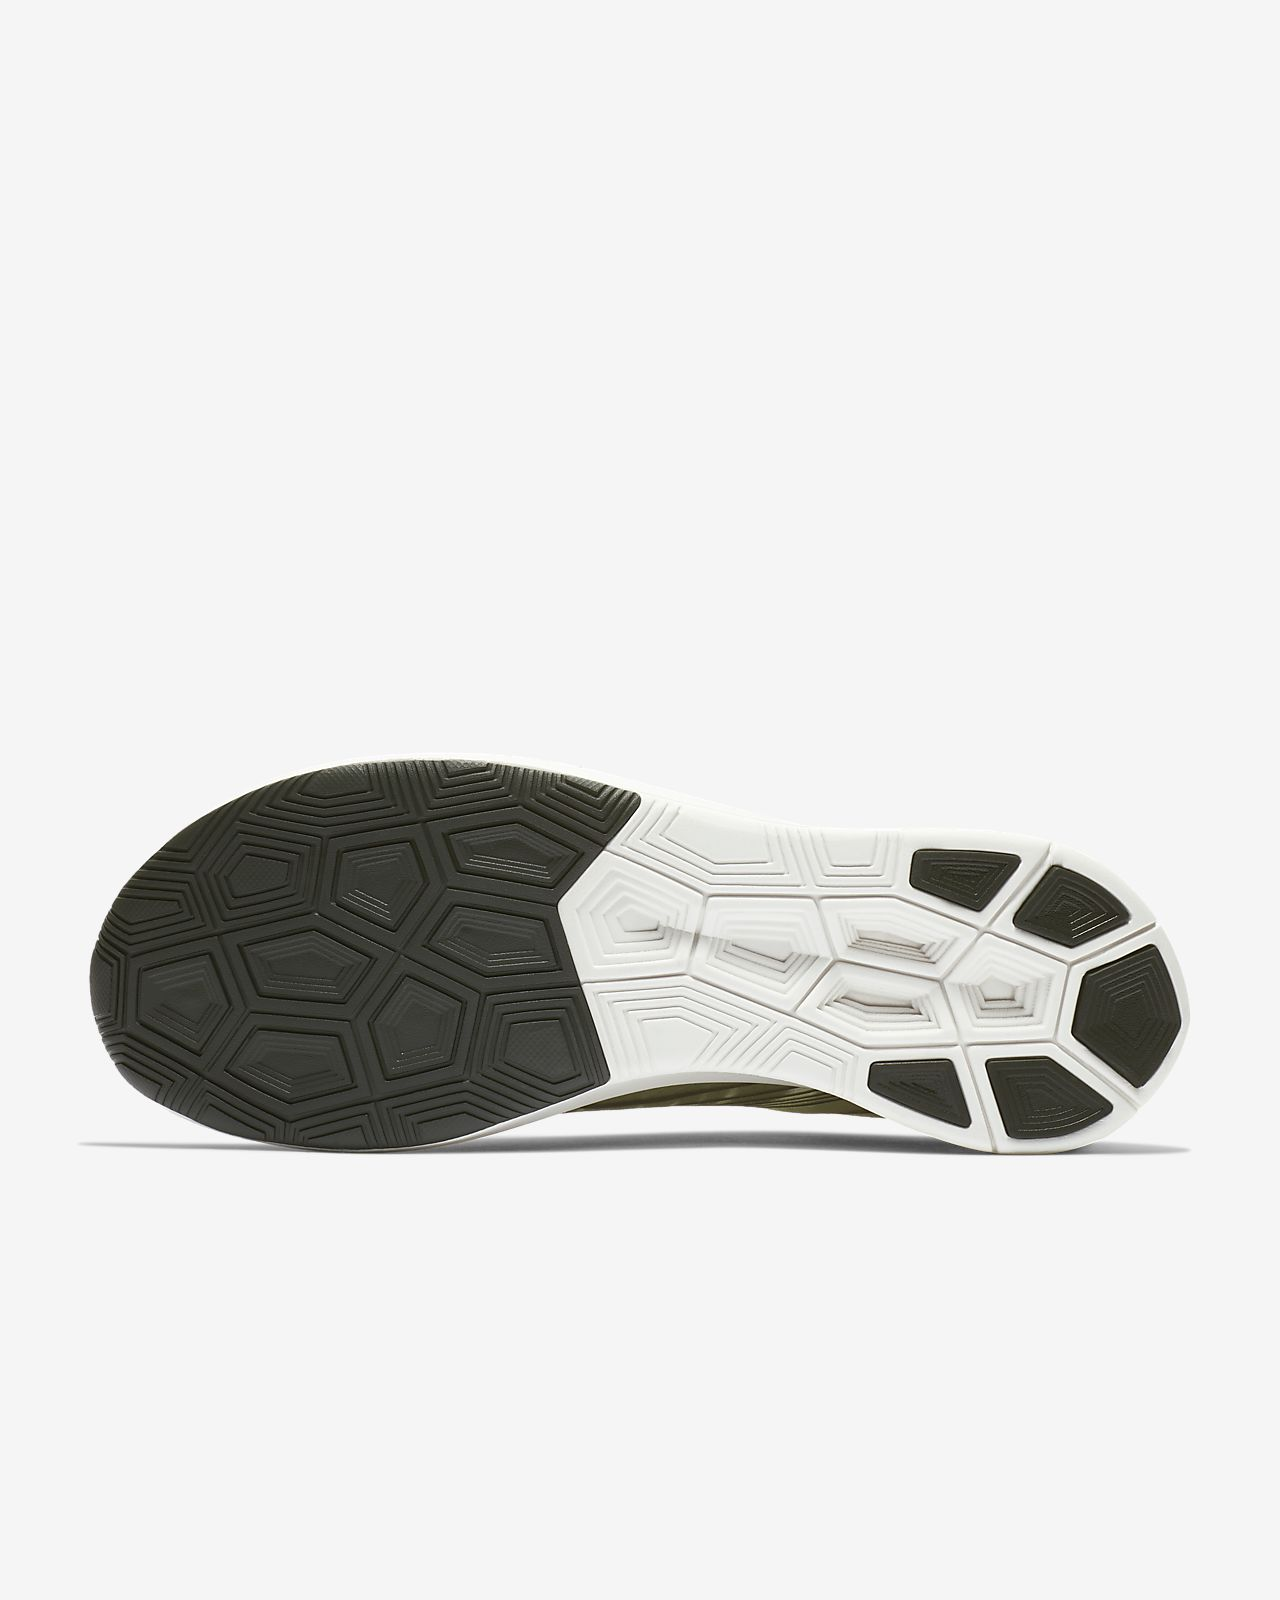 new style 3e909 19266 Nike Zoom Fly SP Men's Running Shoe. Nike.com